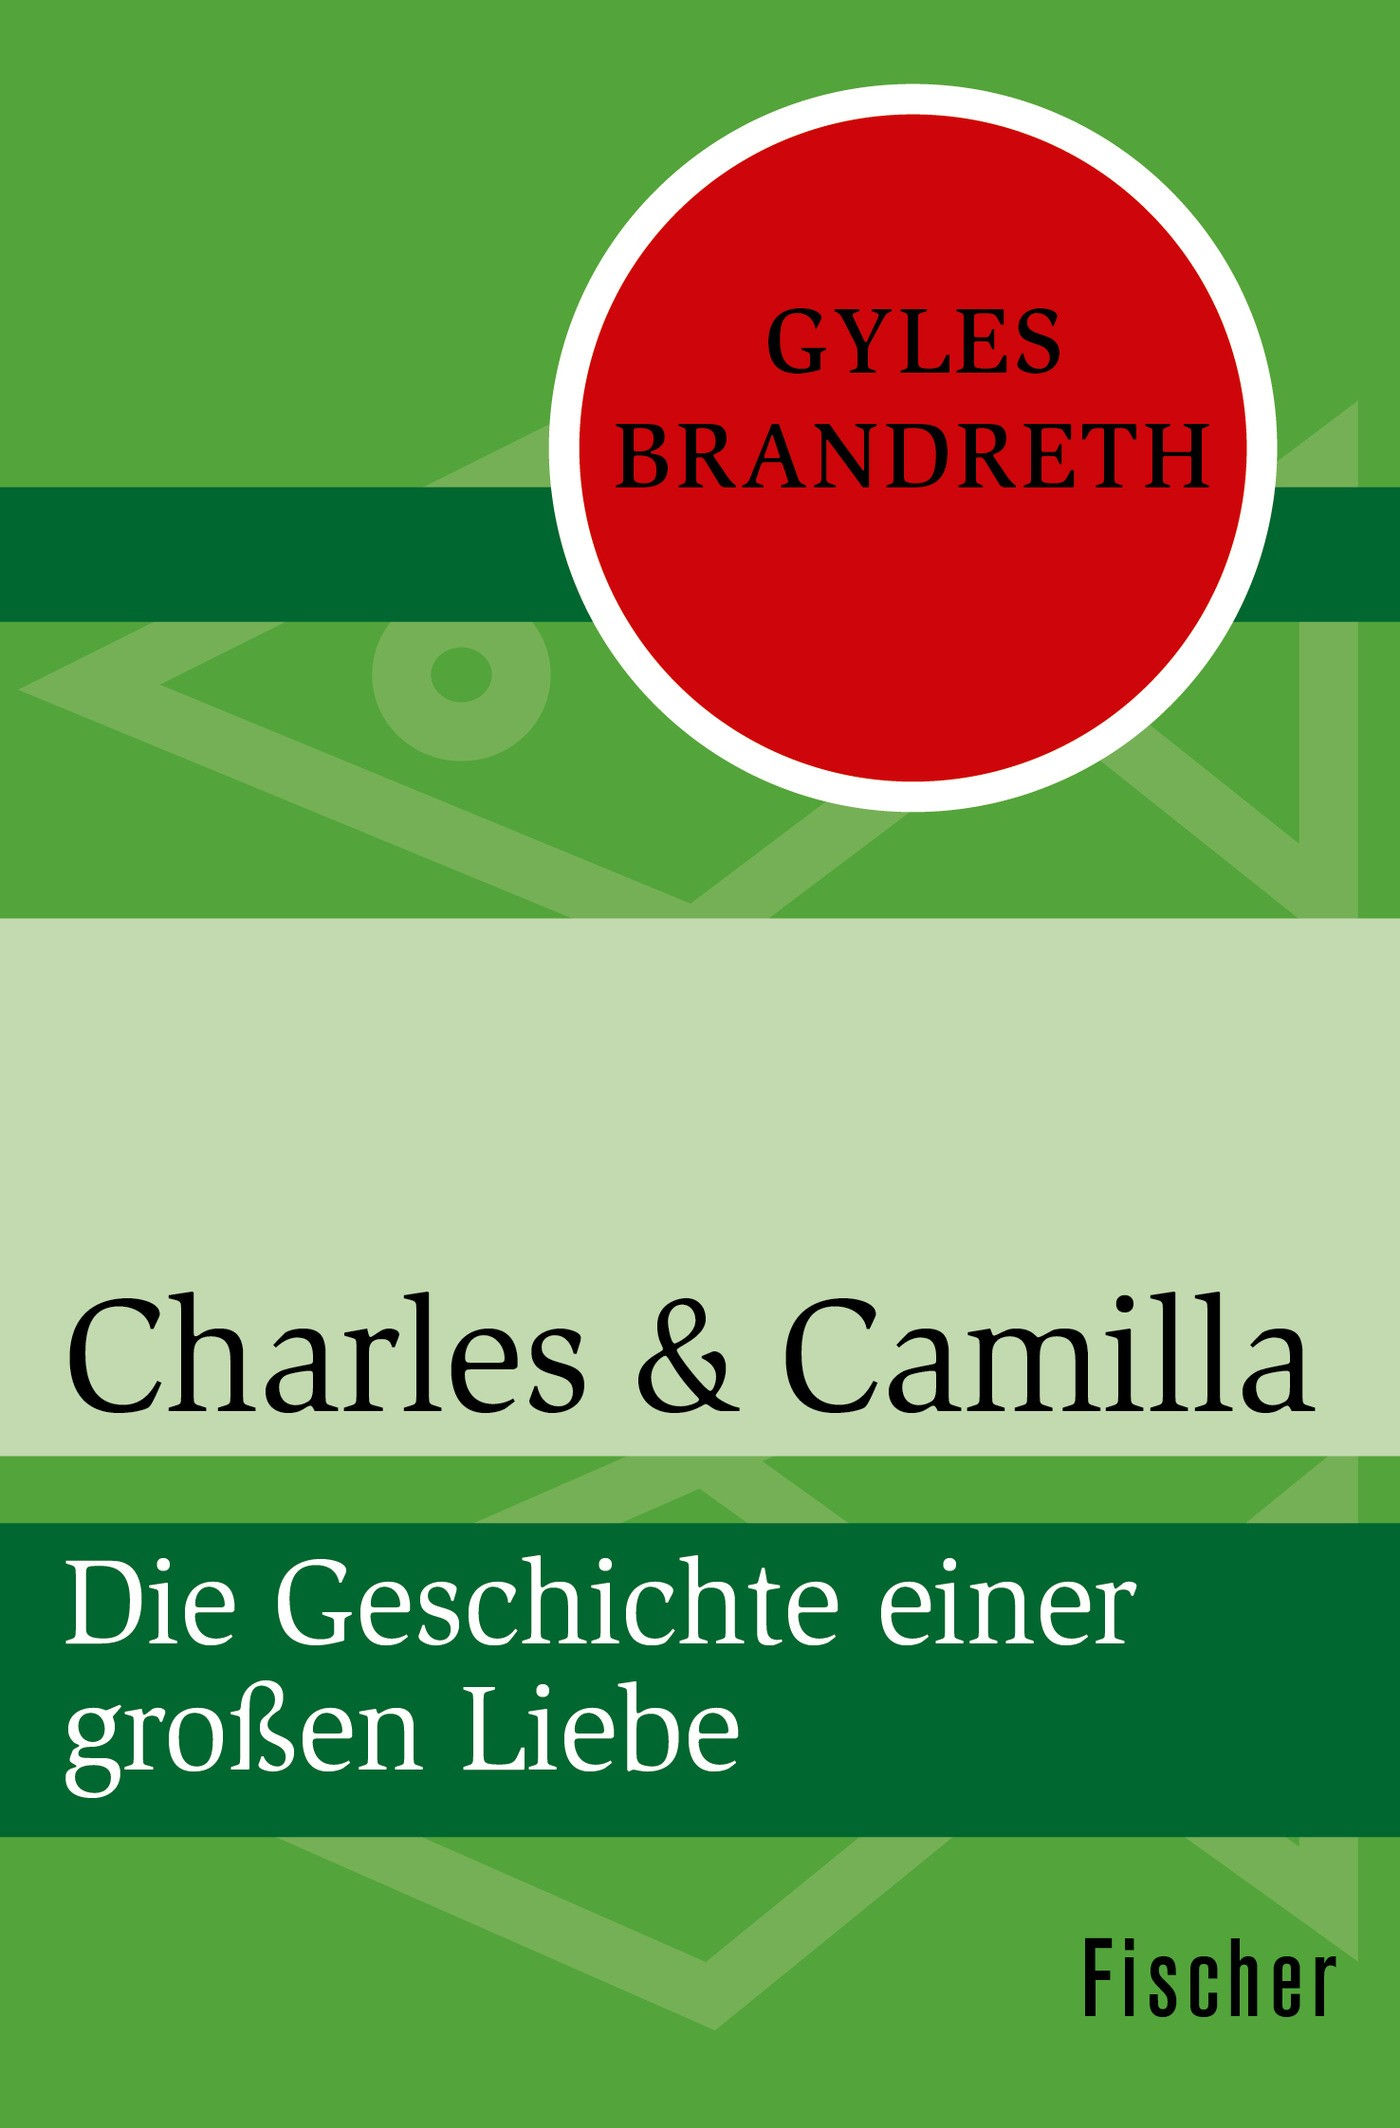 Charles & Camilla | Brandreth, 2016 | Buch (Cover)